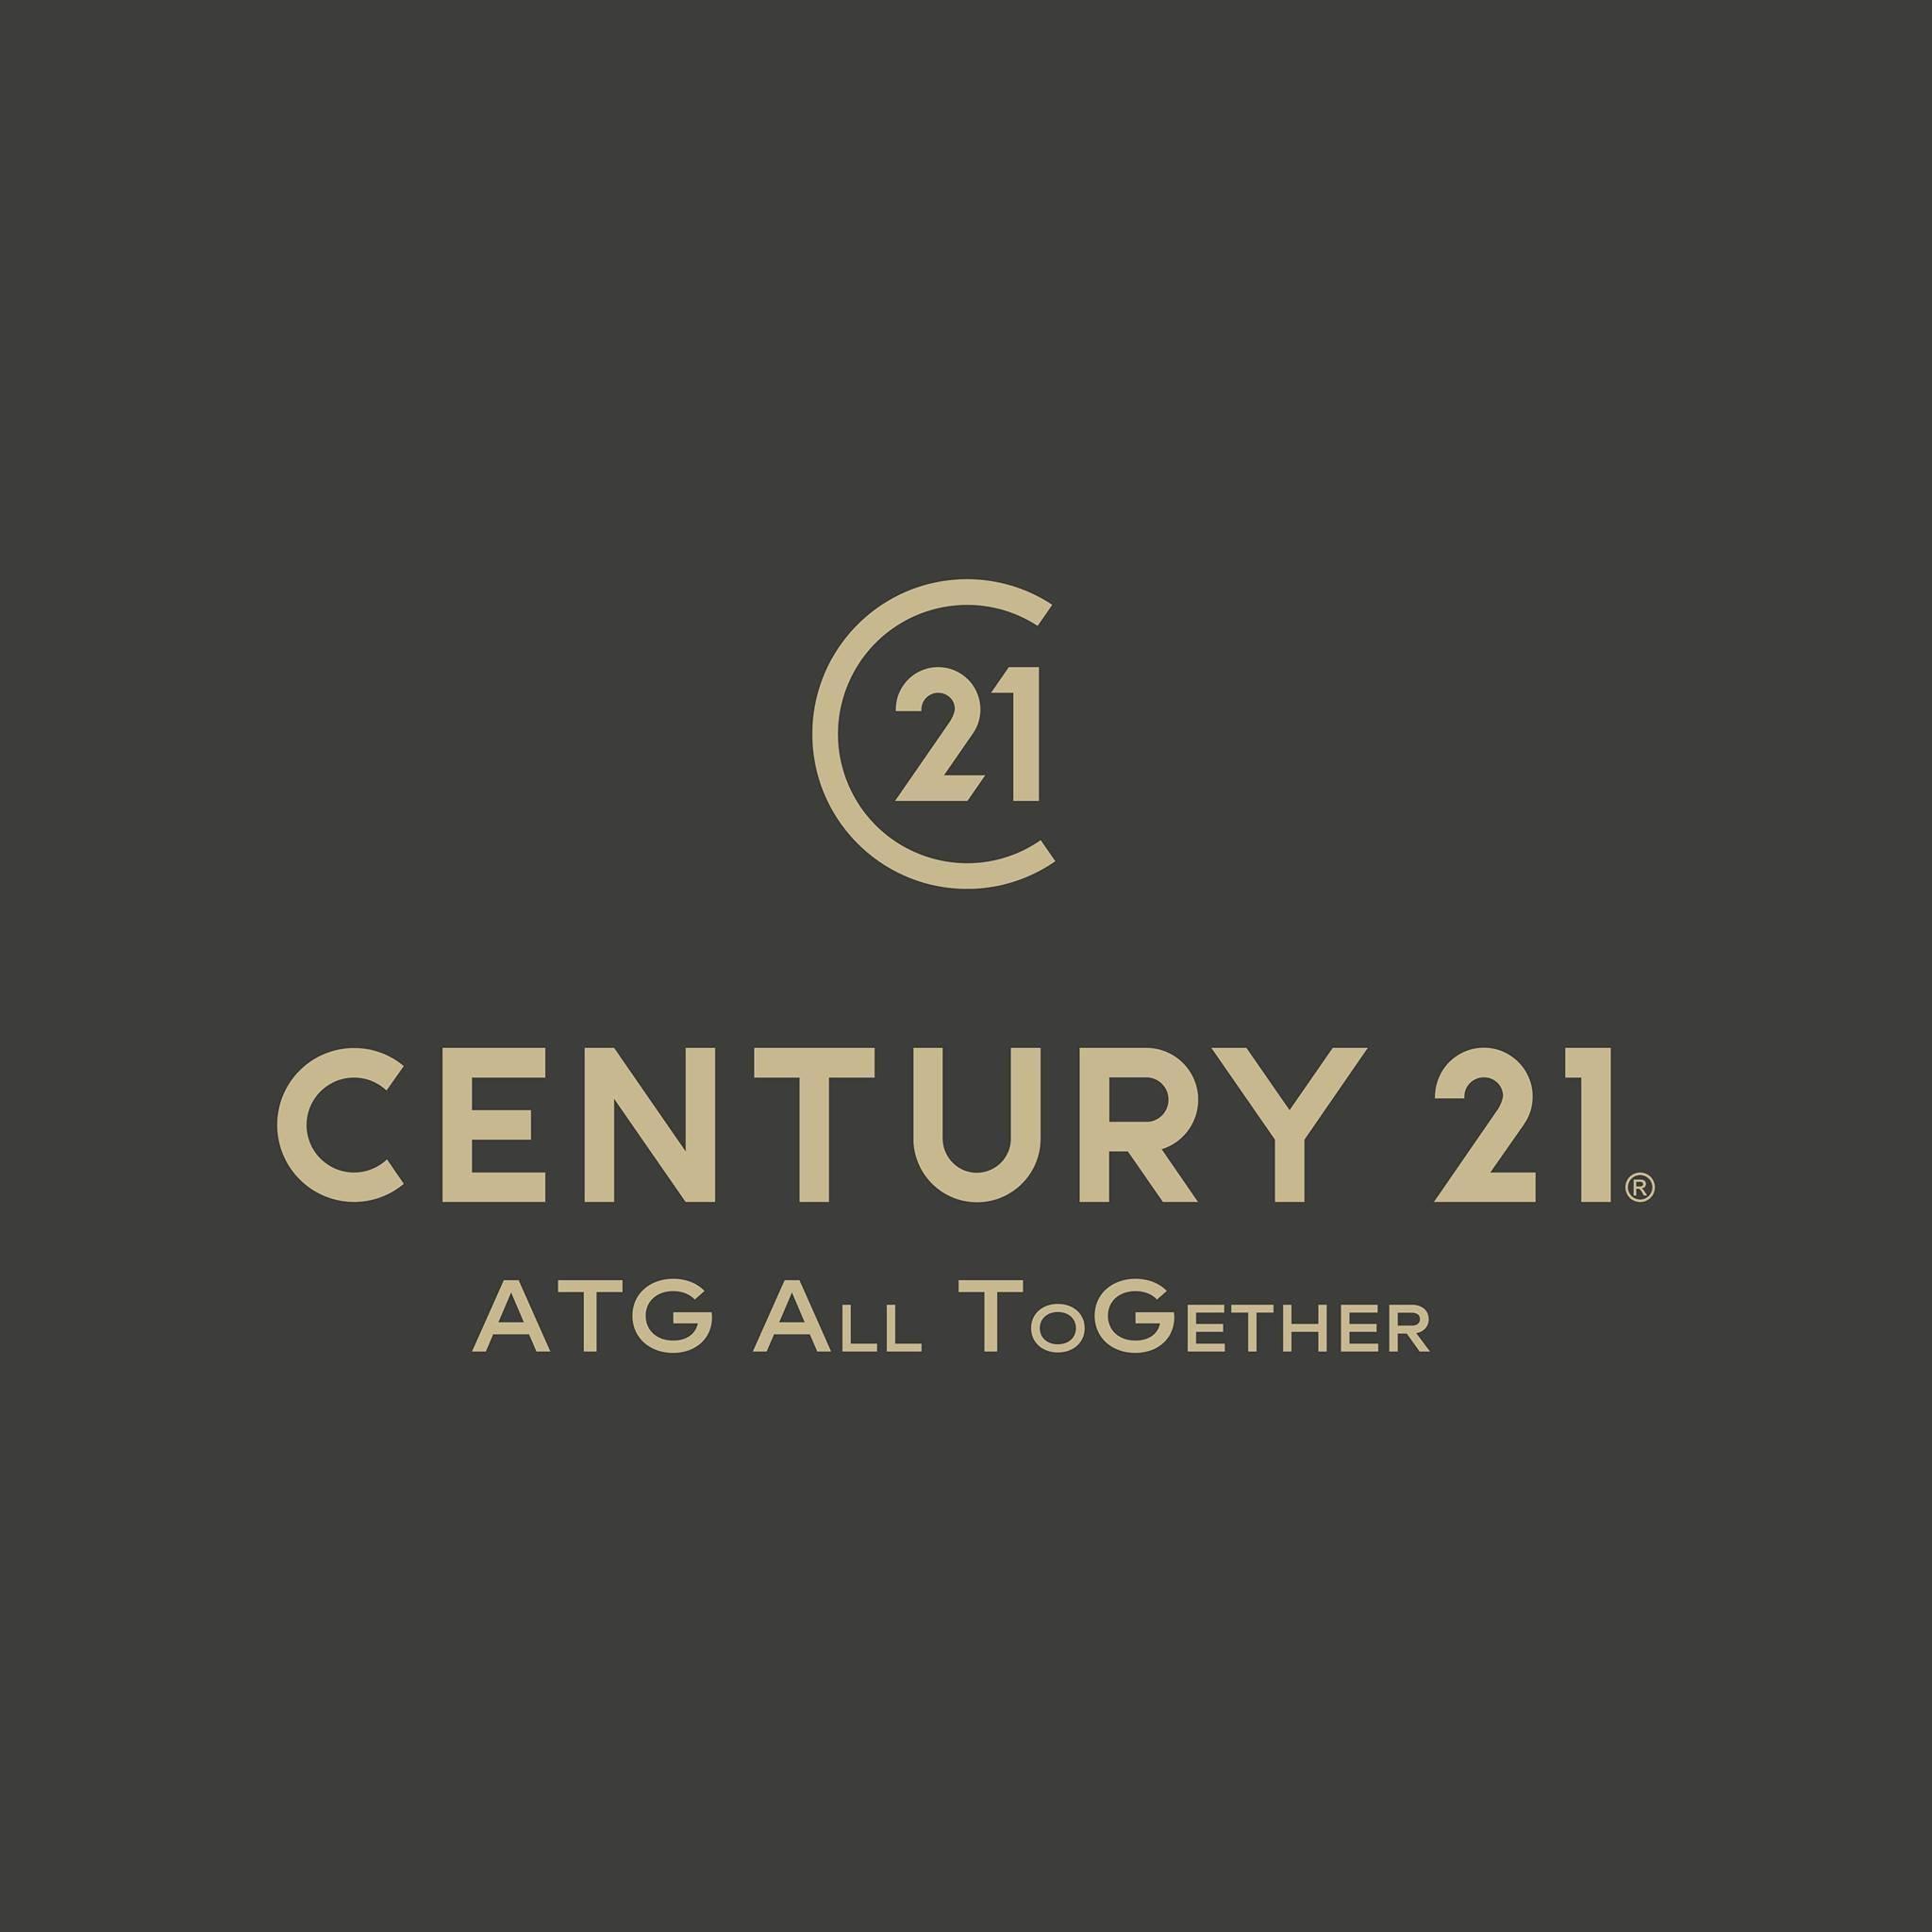 C21 ATG All ToGether